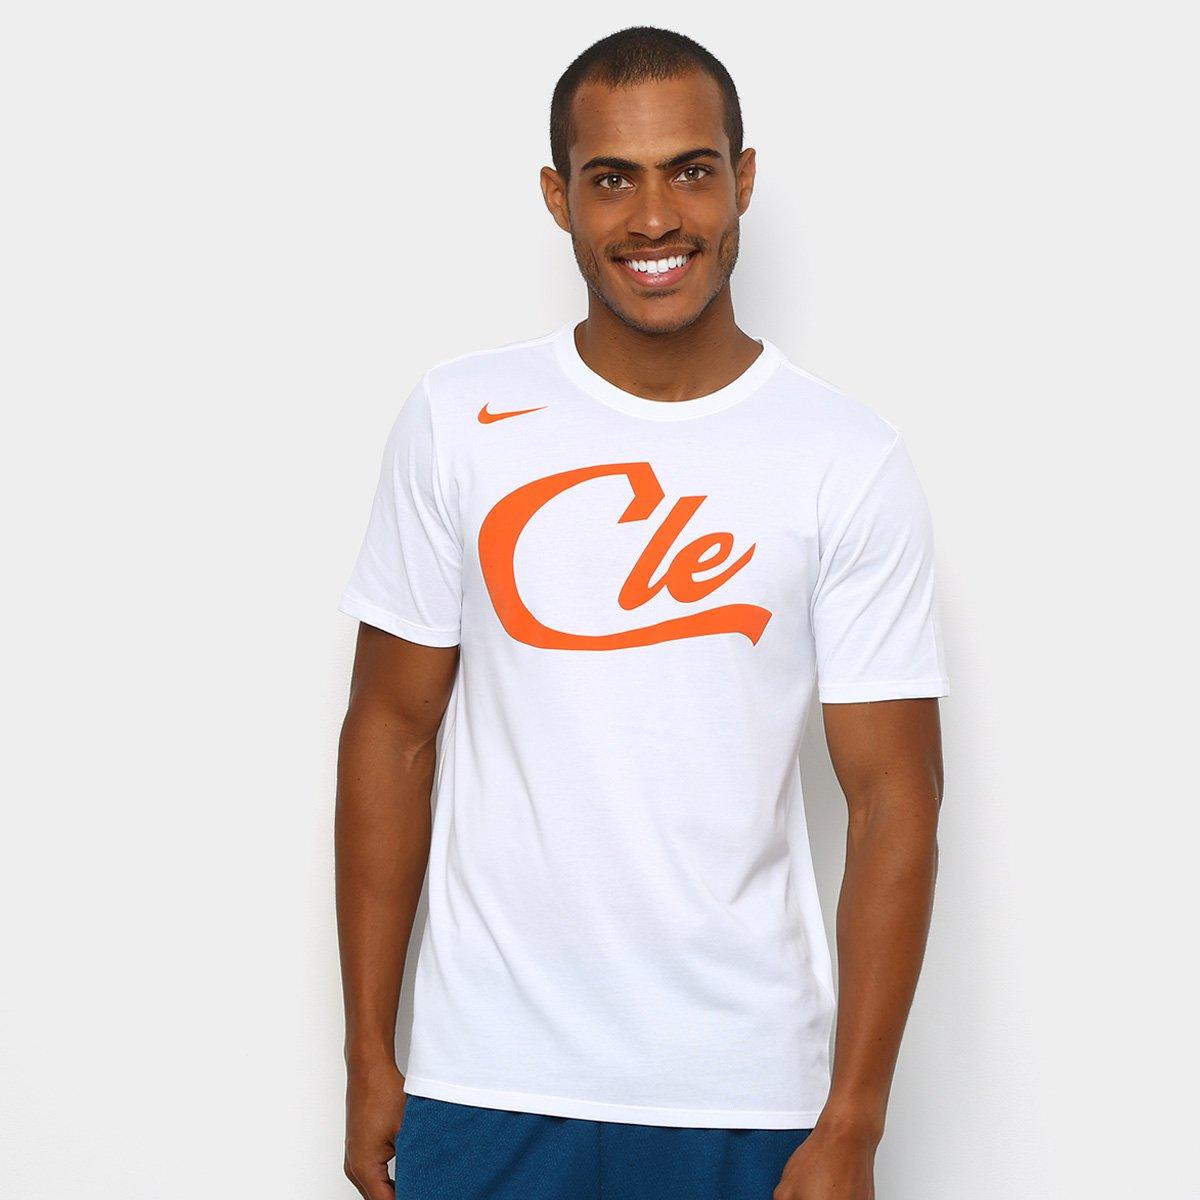 3877c8de0 Camiseta NBA Cleveland Cavaliers Nike City Edition Masculina - Branco -  Compre Agora